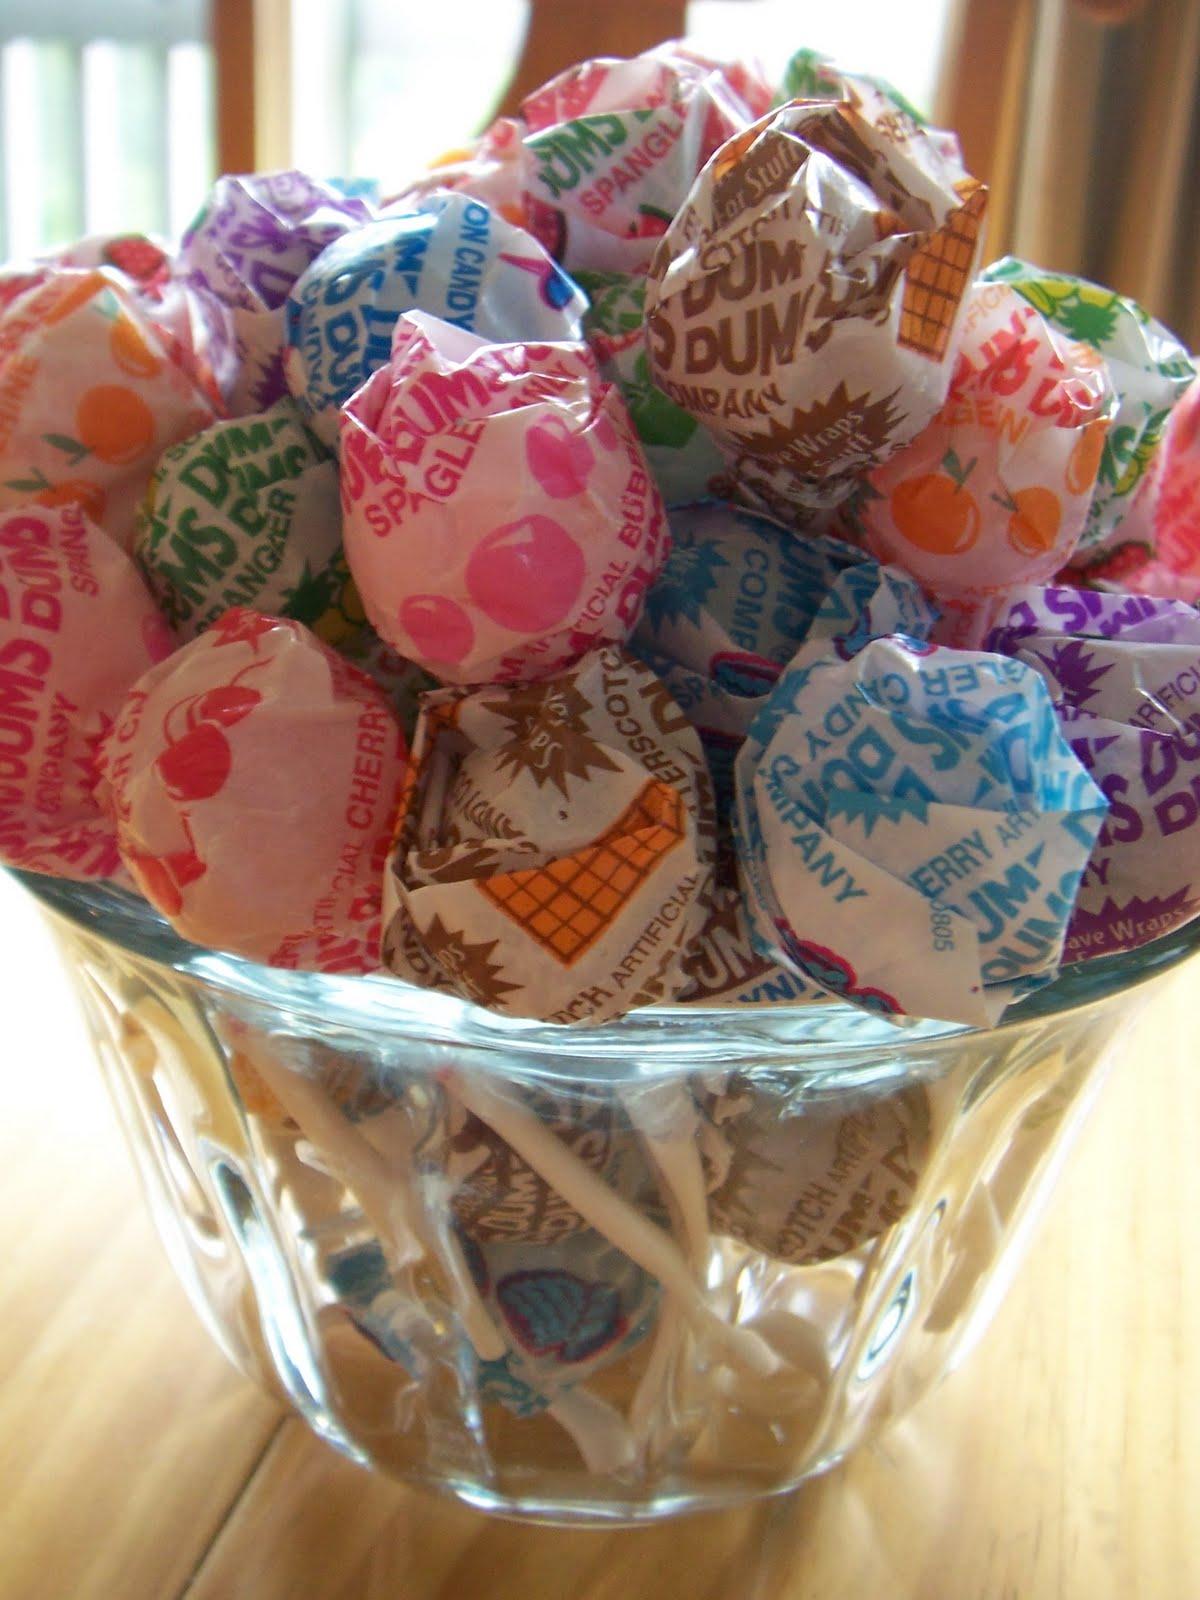 Day 213 - bouquet of lollipops